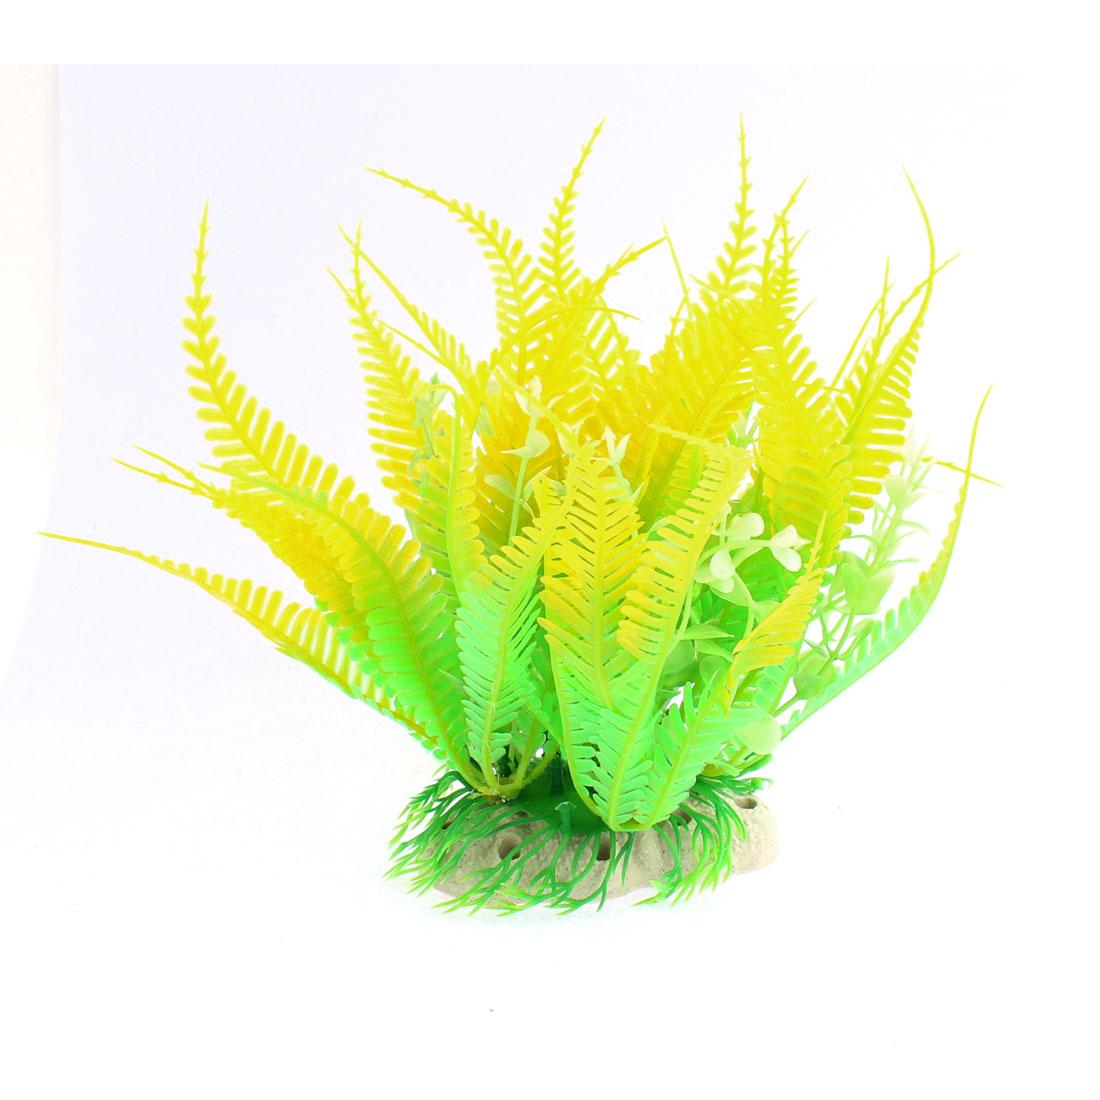 Aquarium Ceramic Base Plastic Simulation Water Plant Grass Ornament Yellow Green